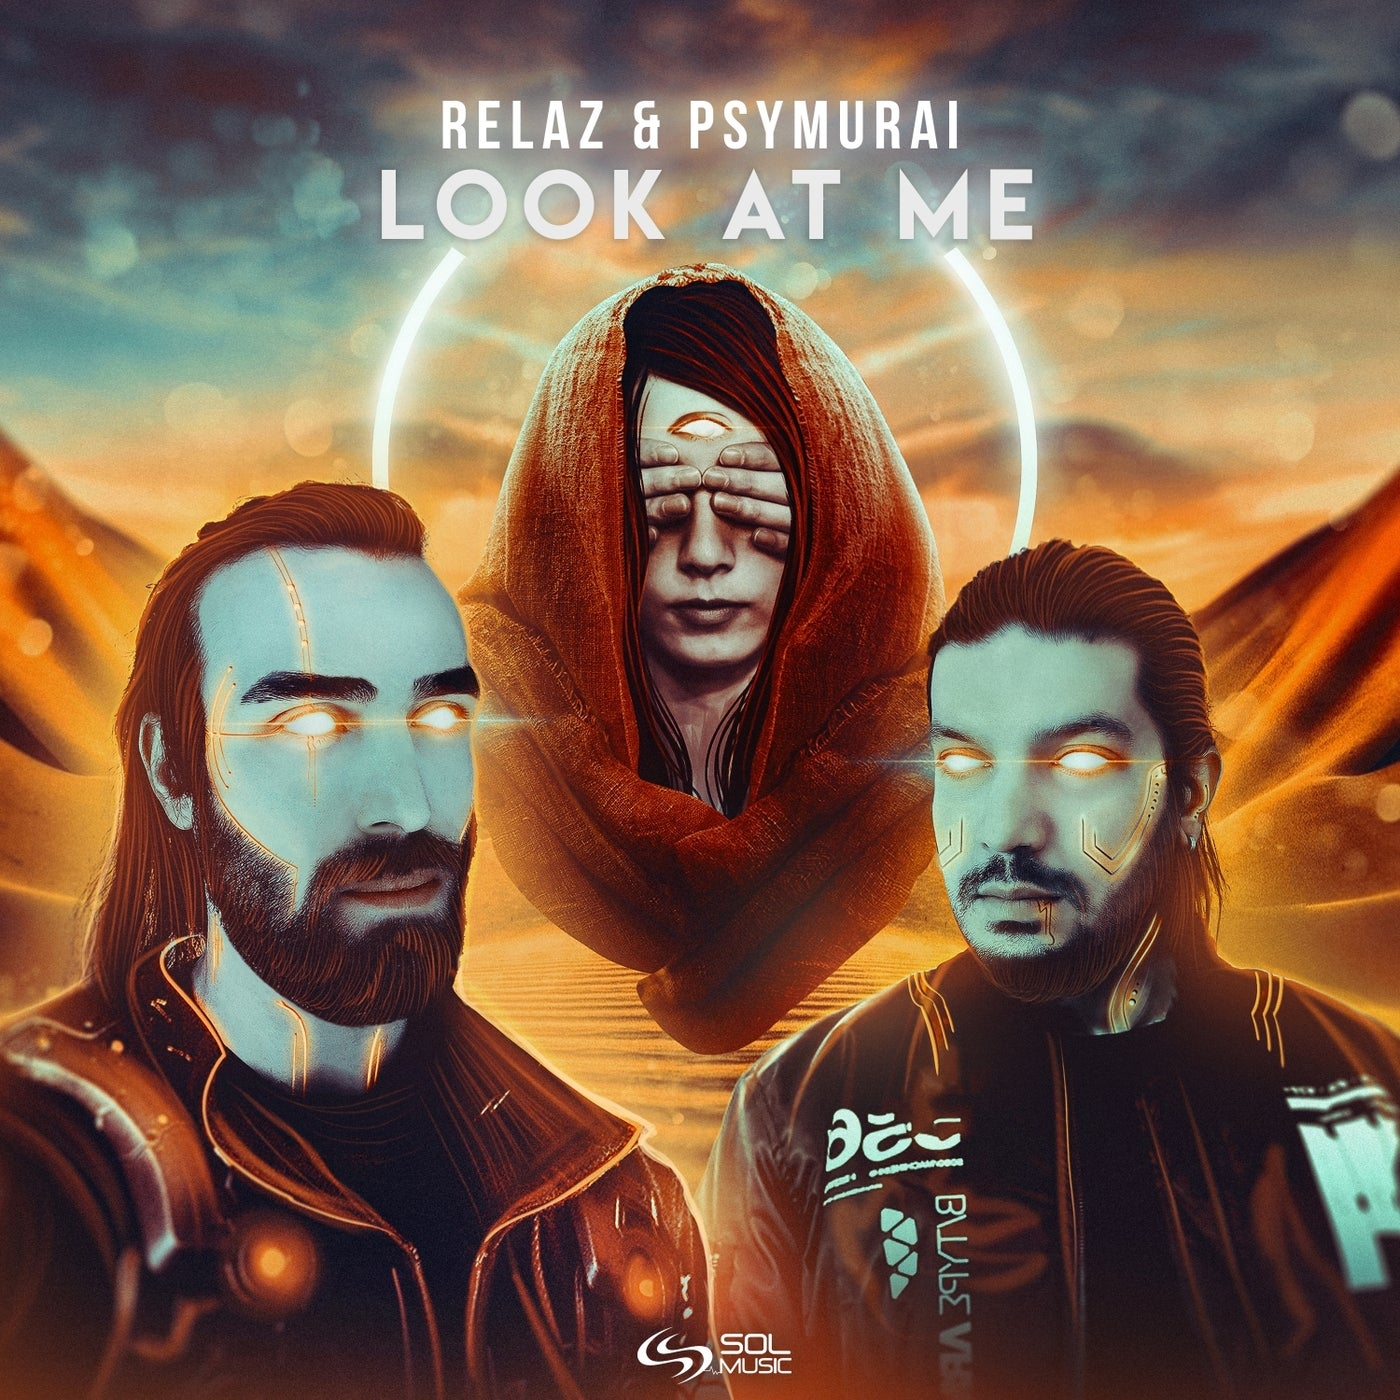 Look at Me (Original Mix)